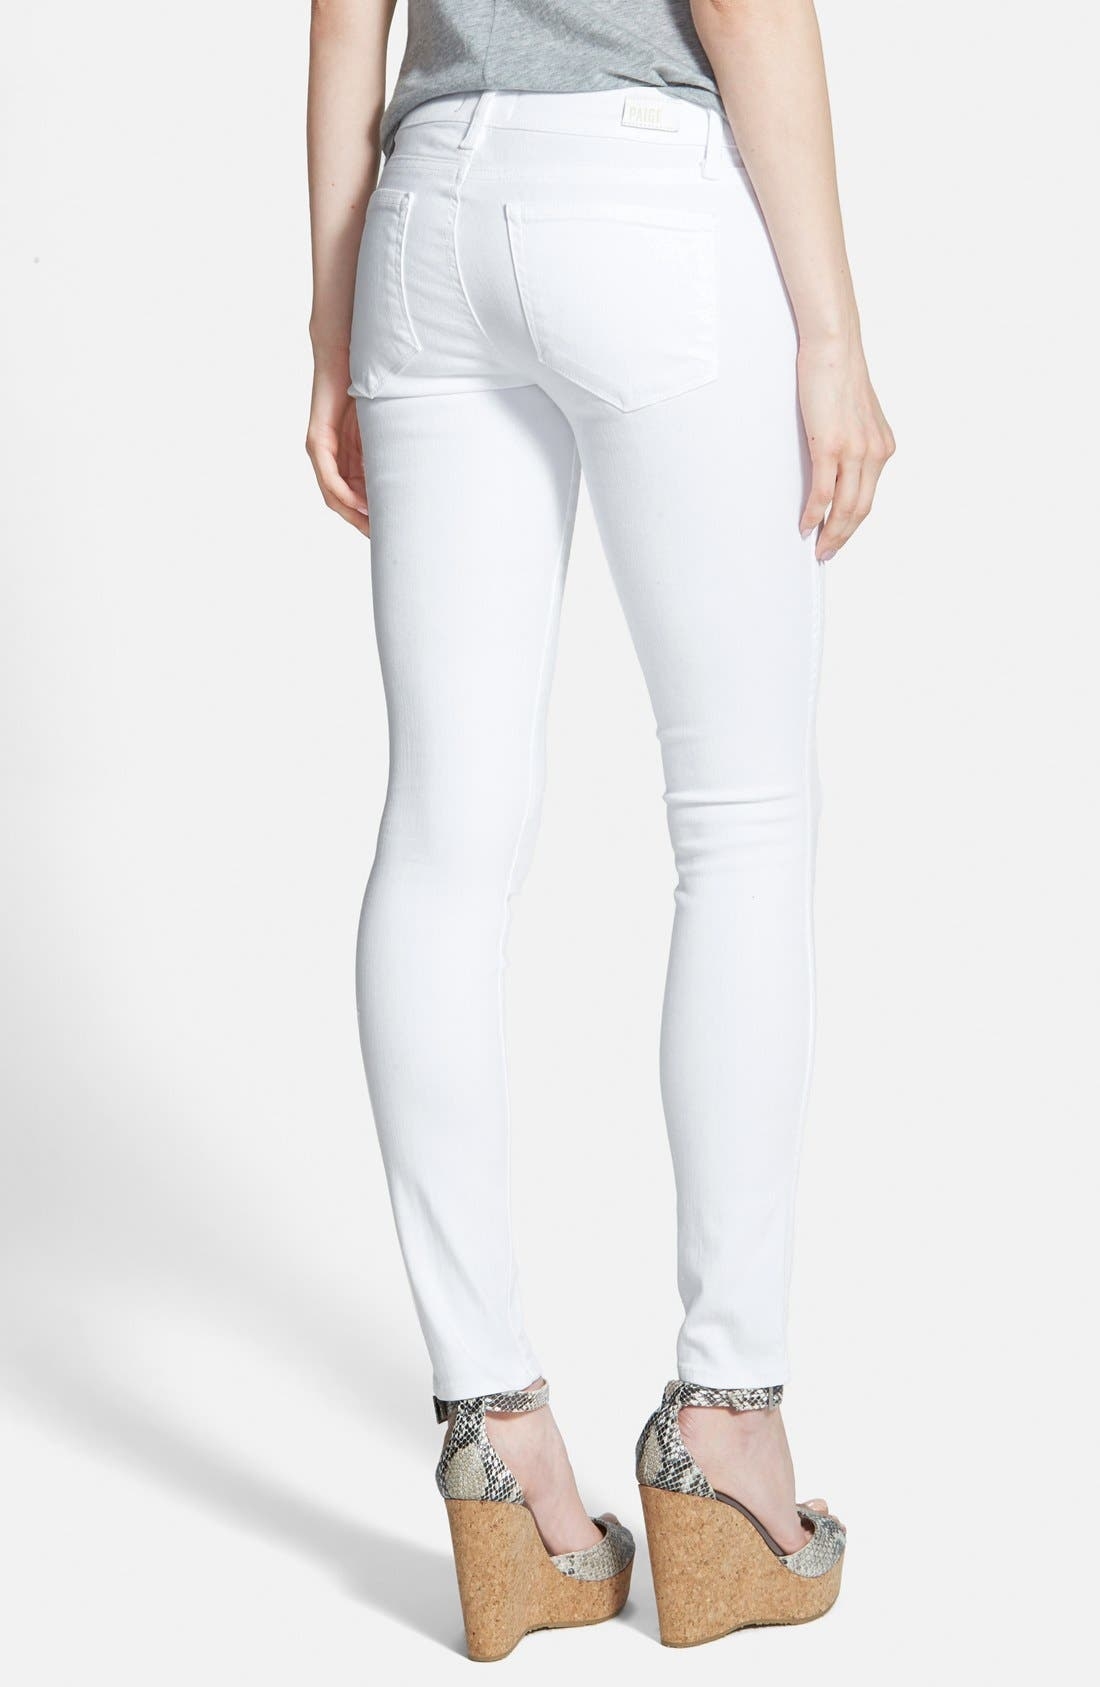 PAIGE, 'Verdugo' Ultra Skinny Jeans, Alternate thumbnail 2, color, 100